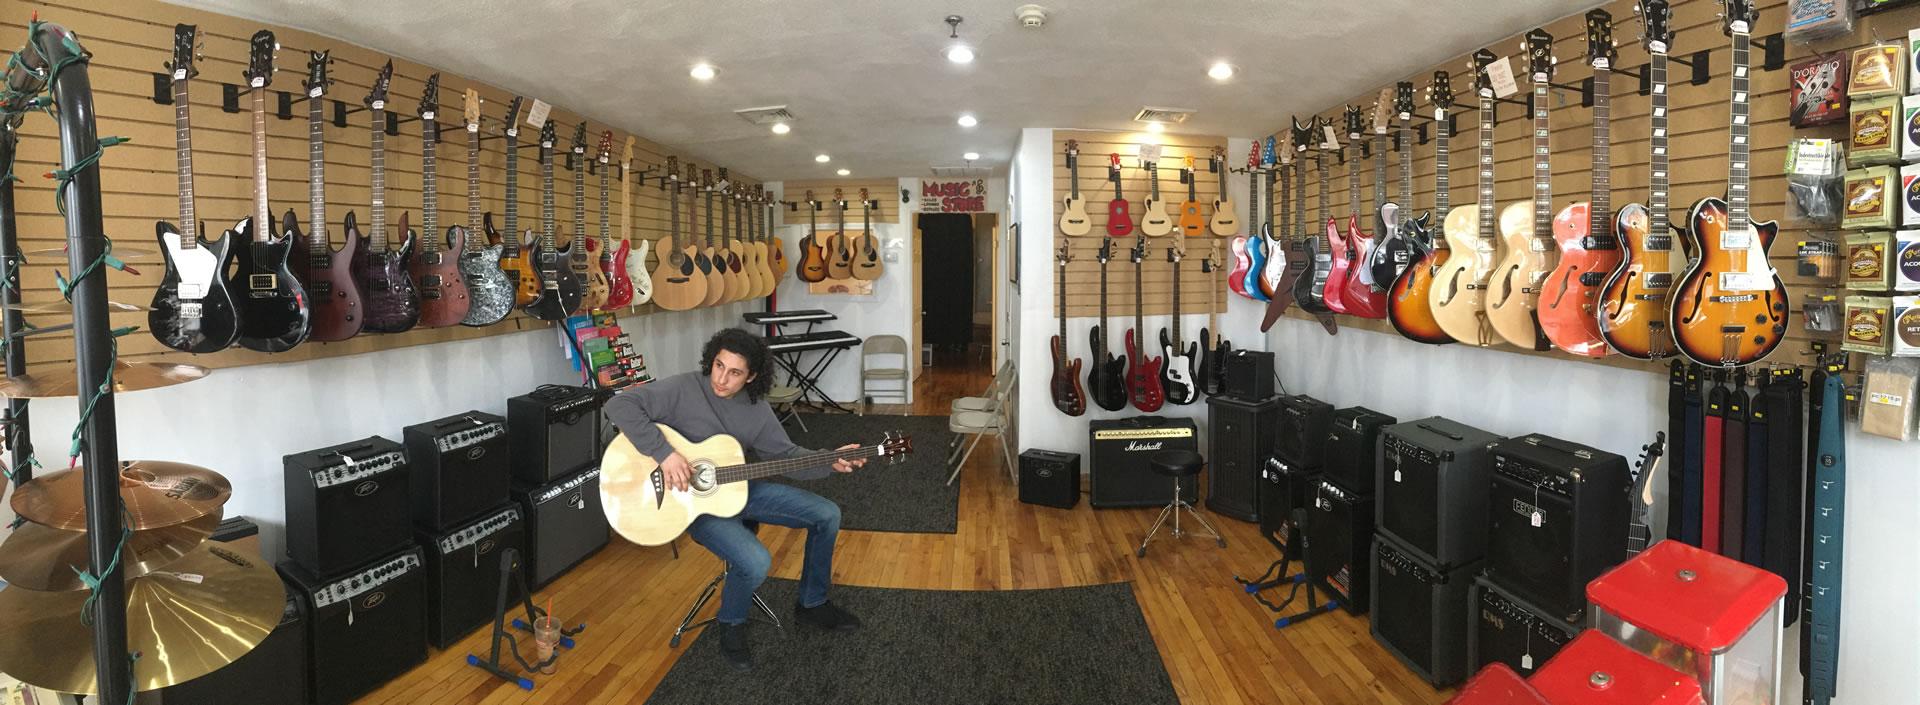 Play Music - Store